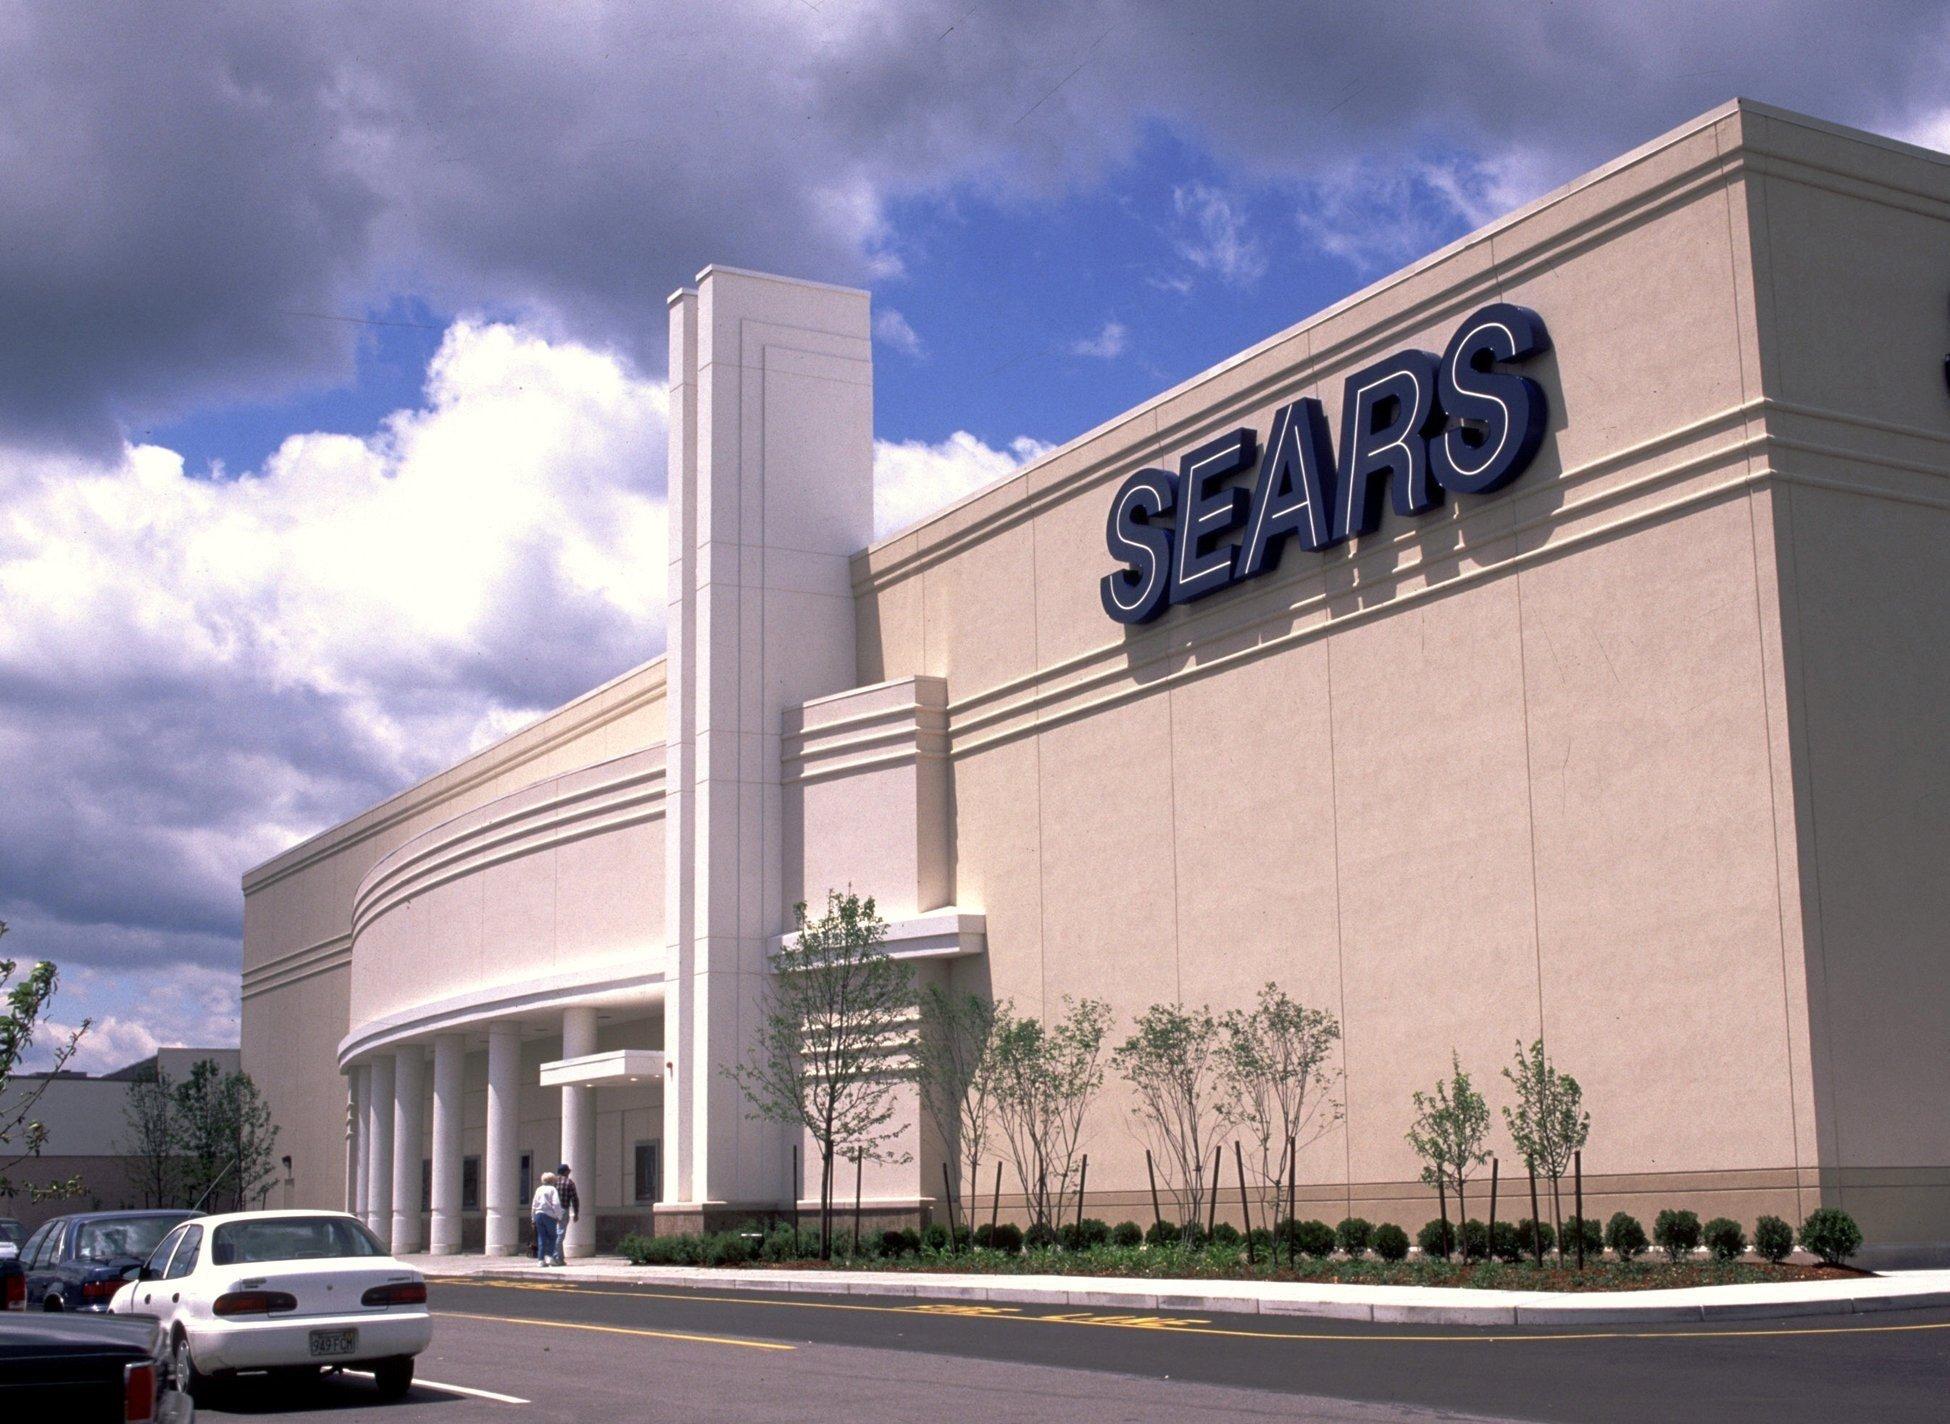 Sears' future in doubt